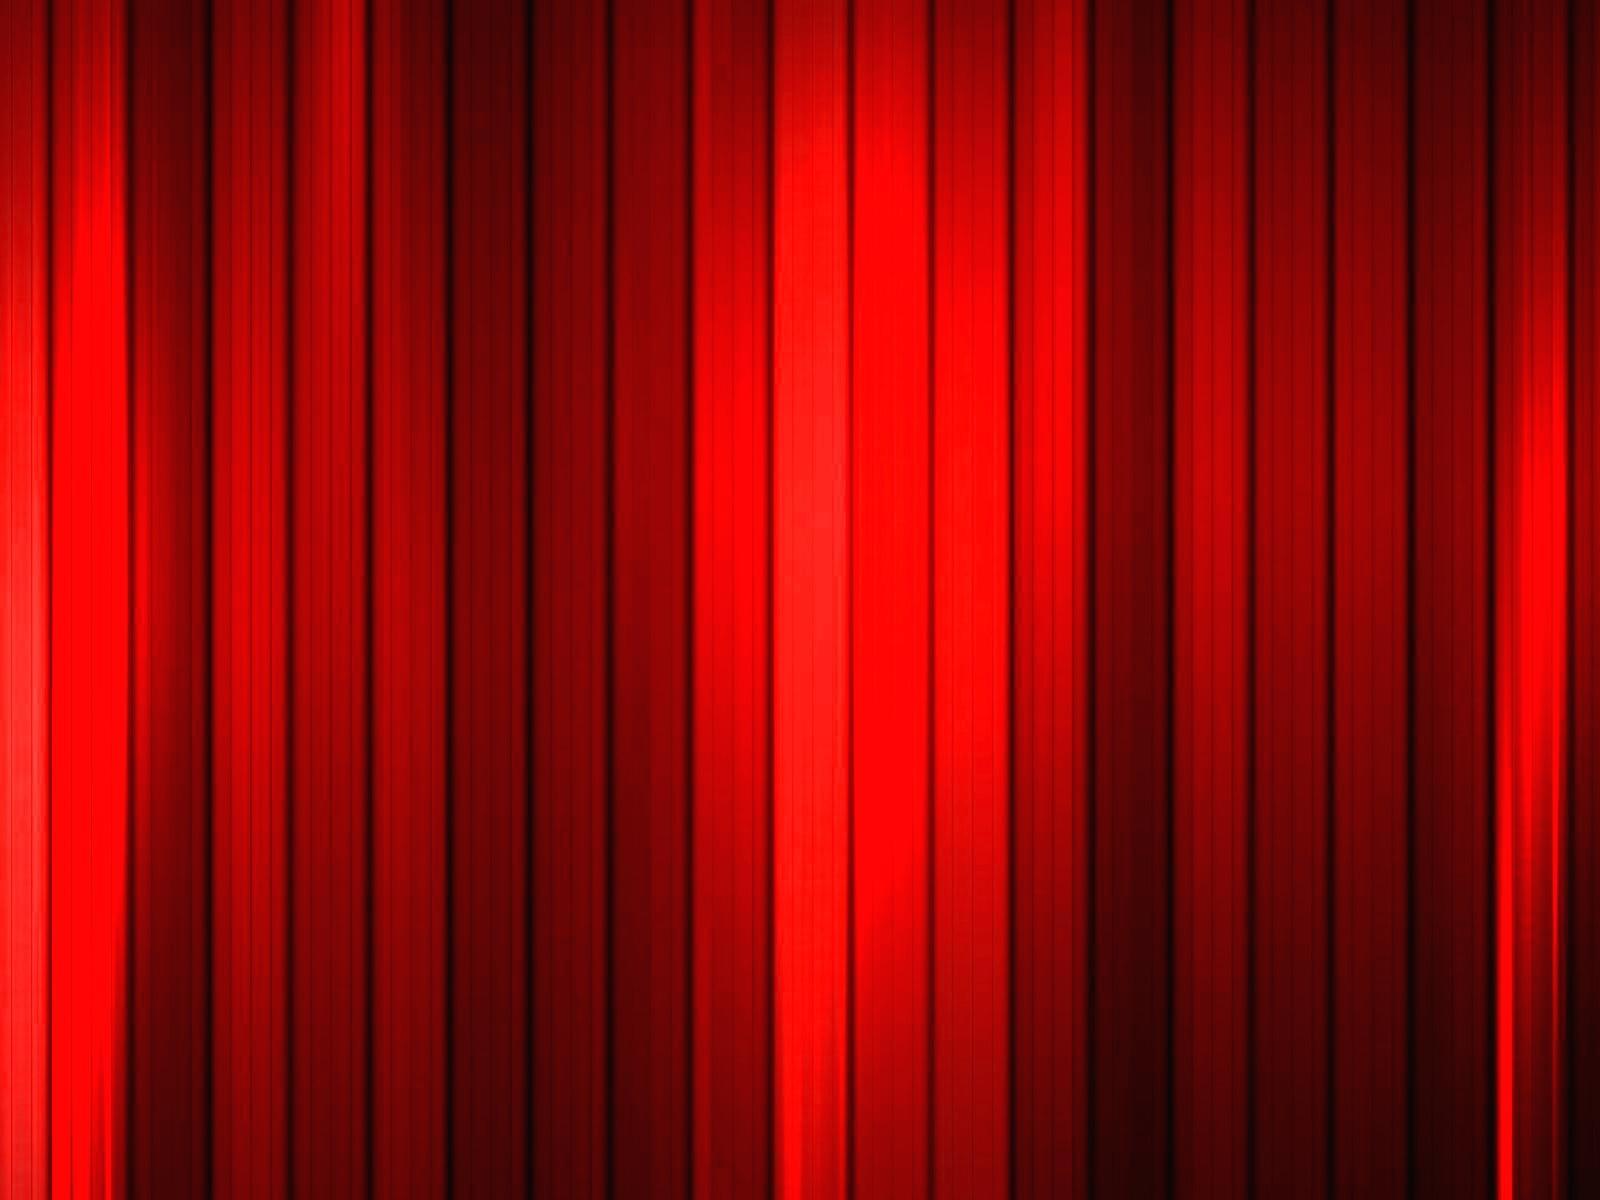 Wallpaper Merah Maroon   High Resolution Red Background ...